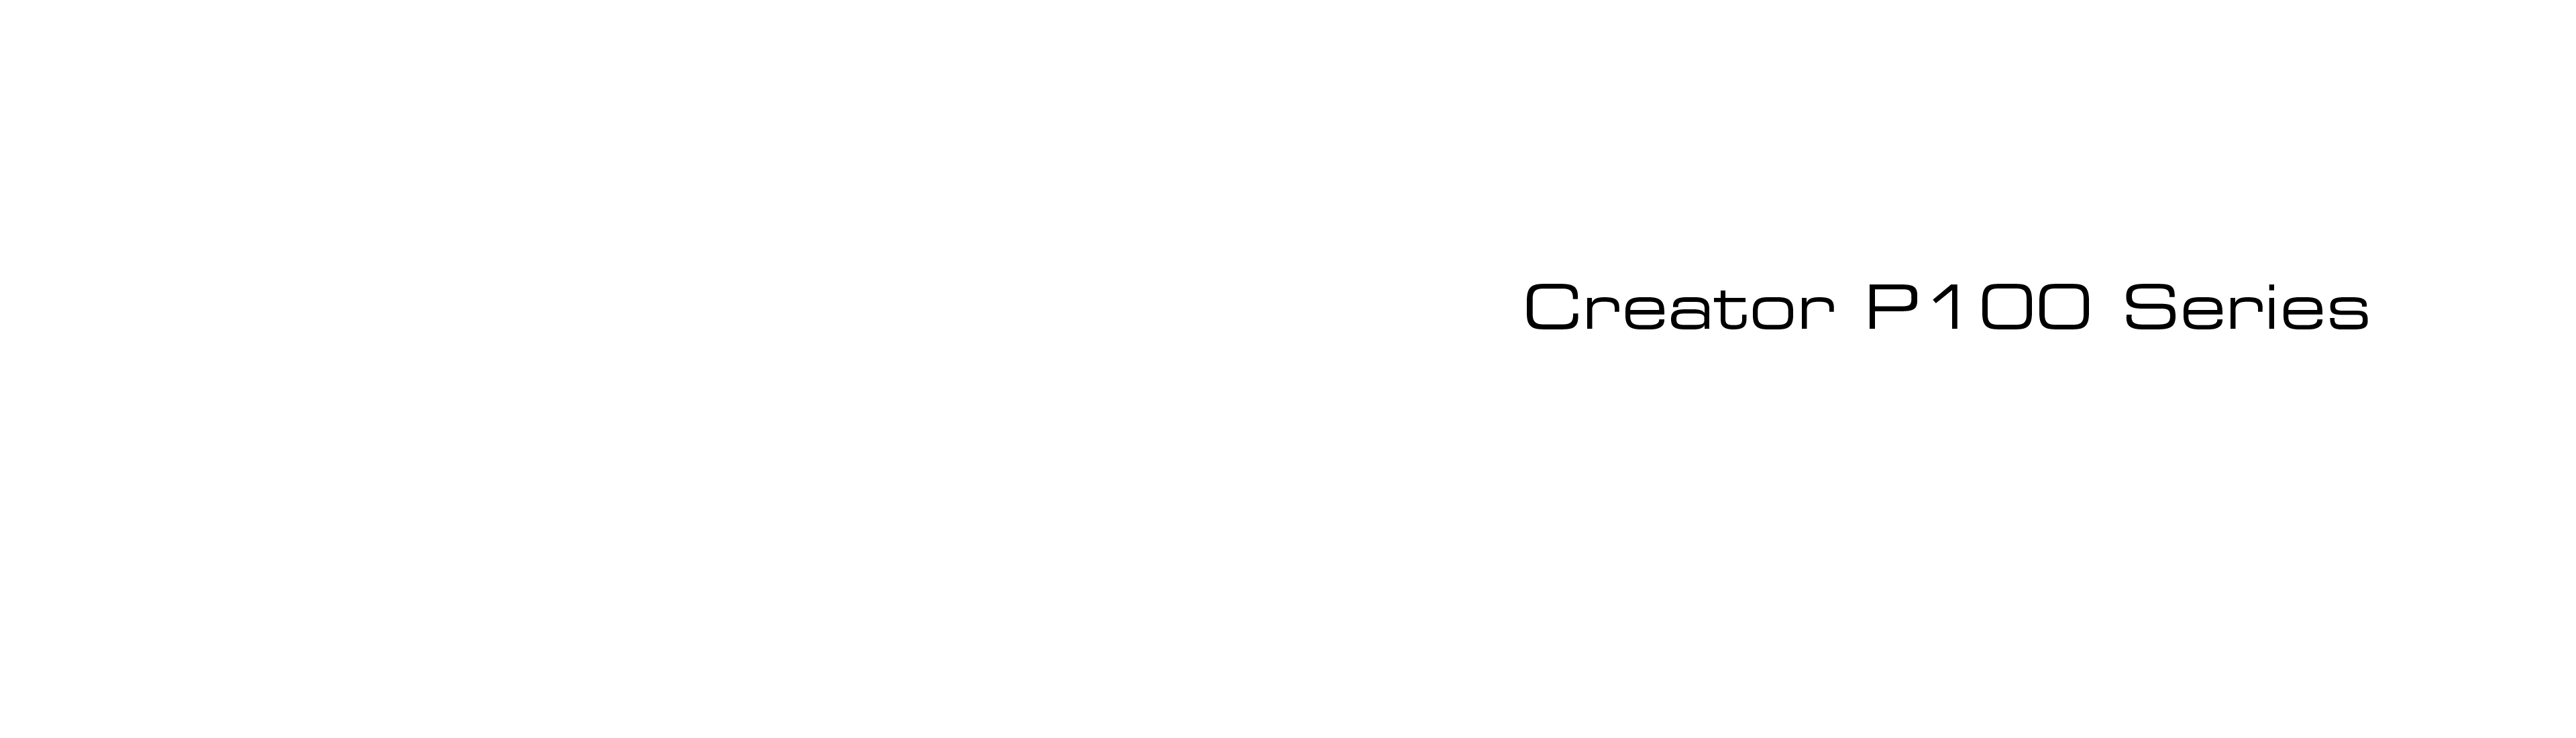 Creator P100 Series